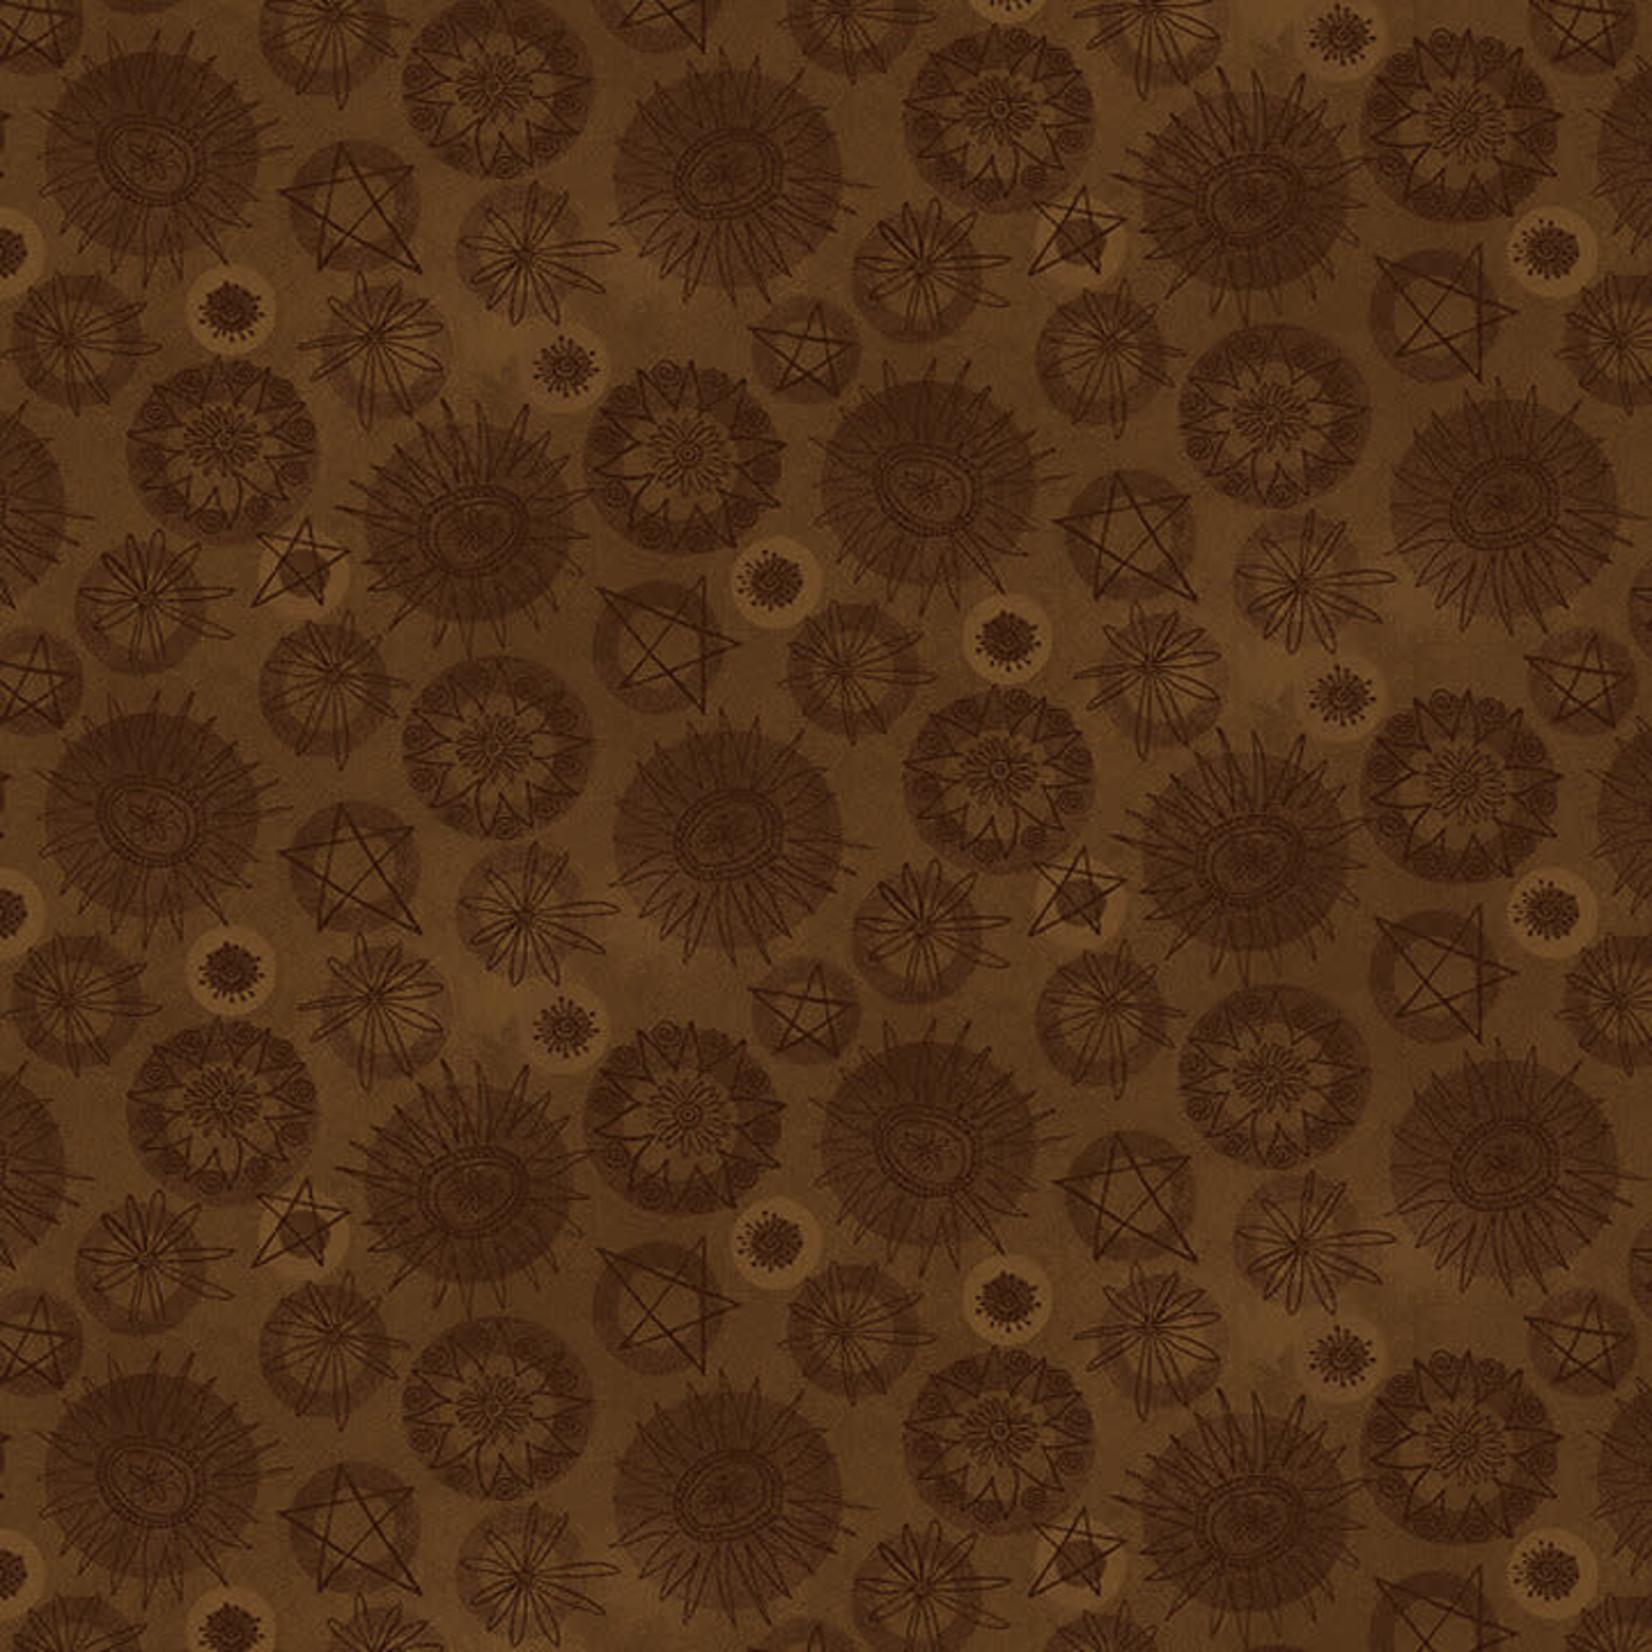 Henry Glass Fabrics Best Of Days - Tonal Flower - Brown